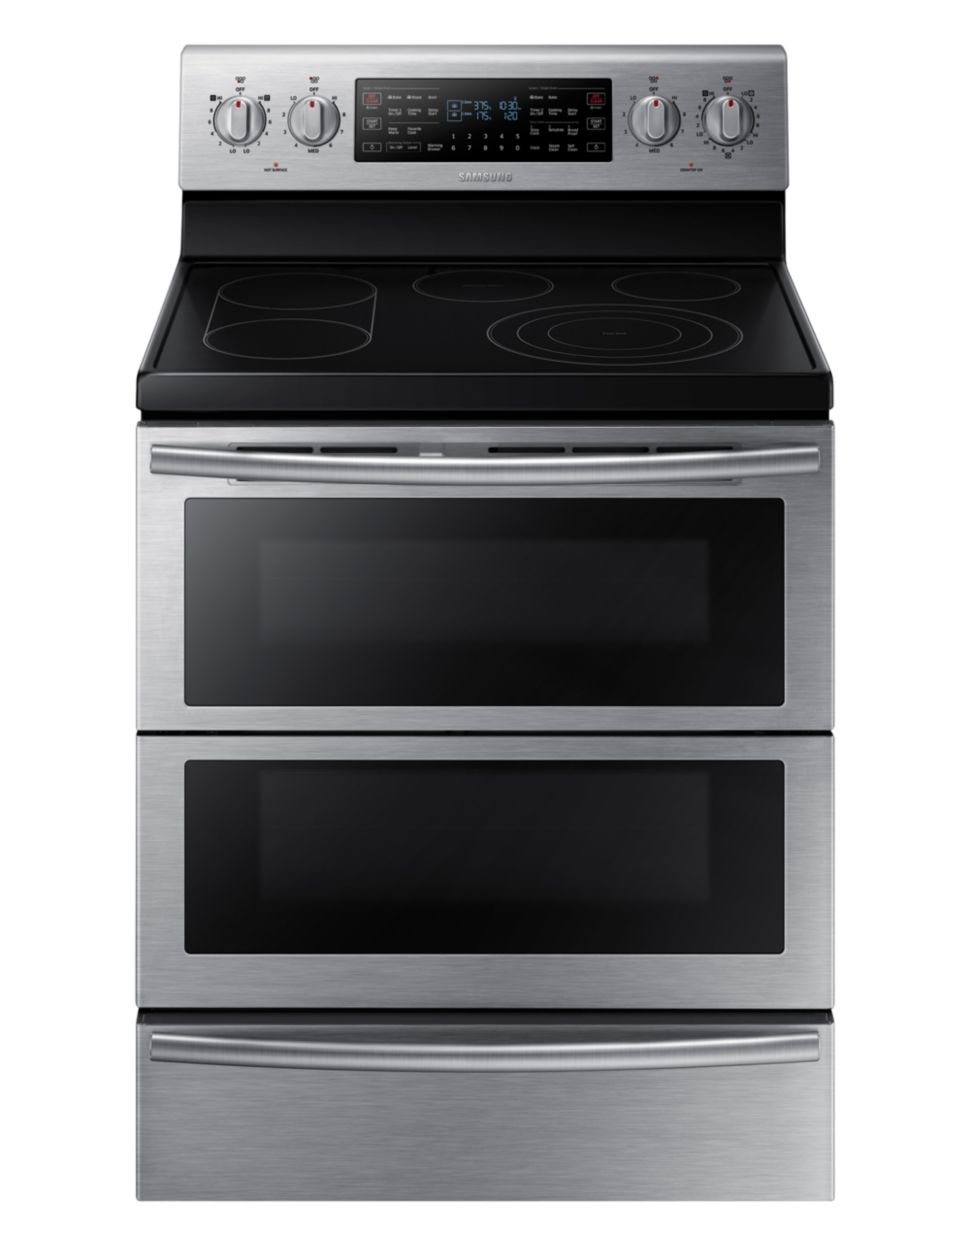 Uncategorized Appliance Stores In Kitchener major kitchen appliances laundry hudsons bay 5 9 cu ft flex duo cooking true convection range